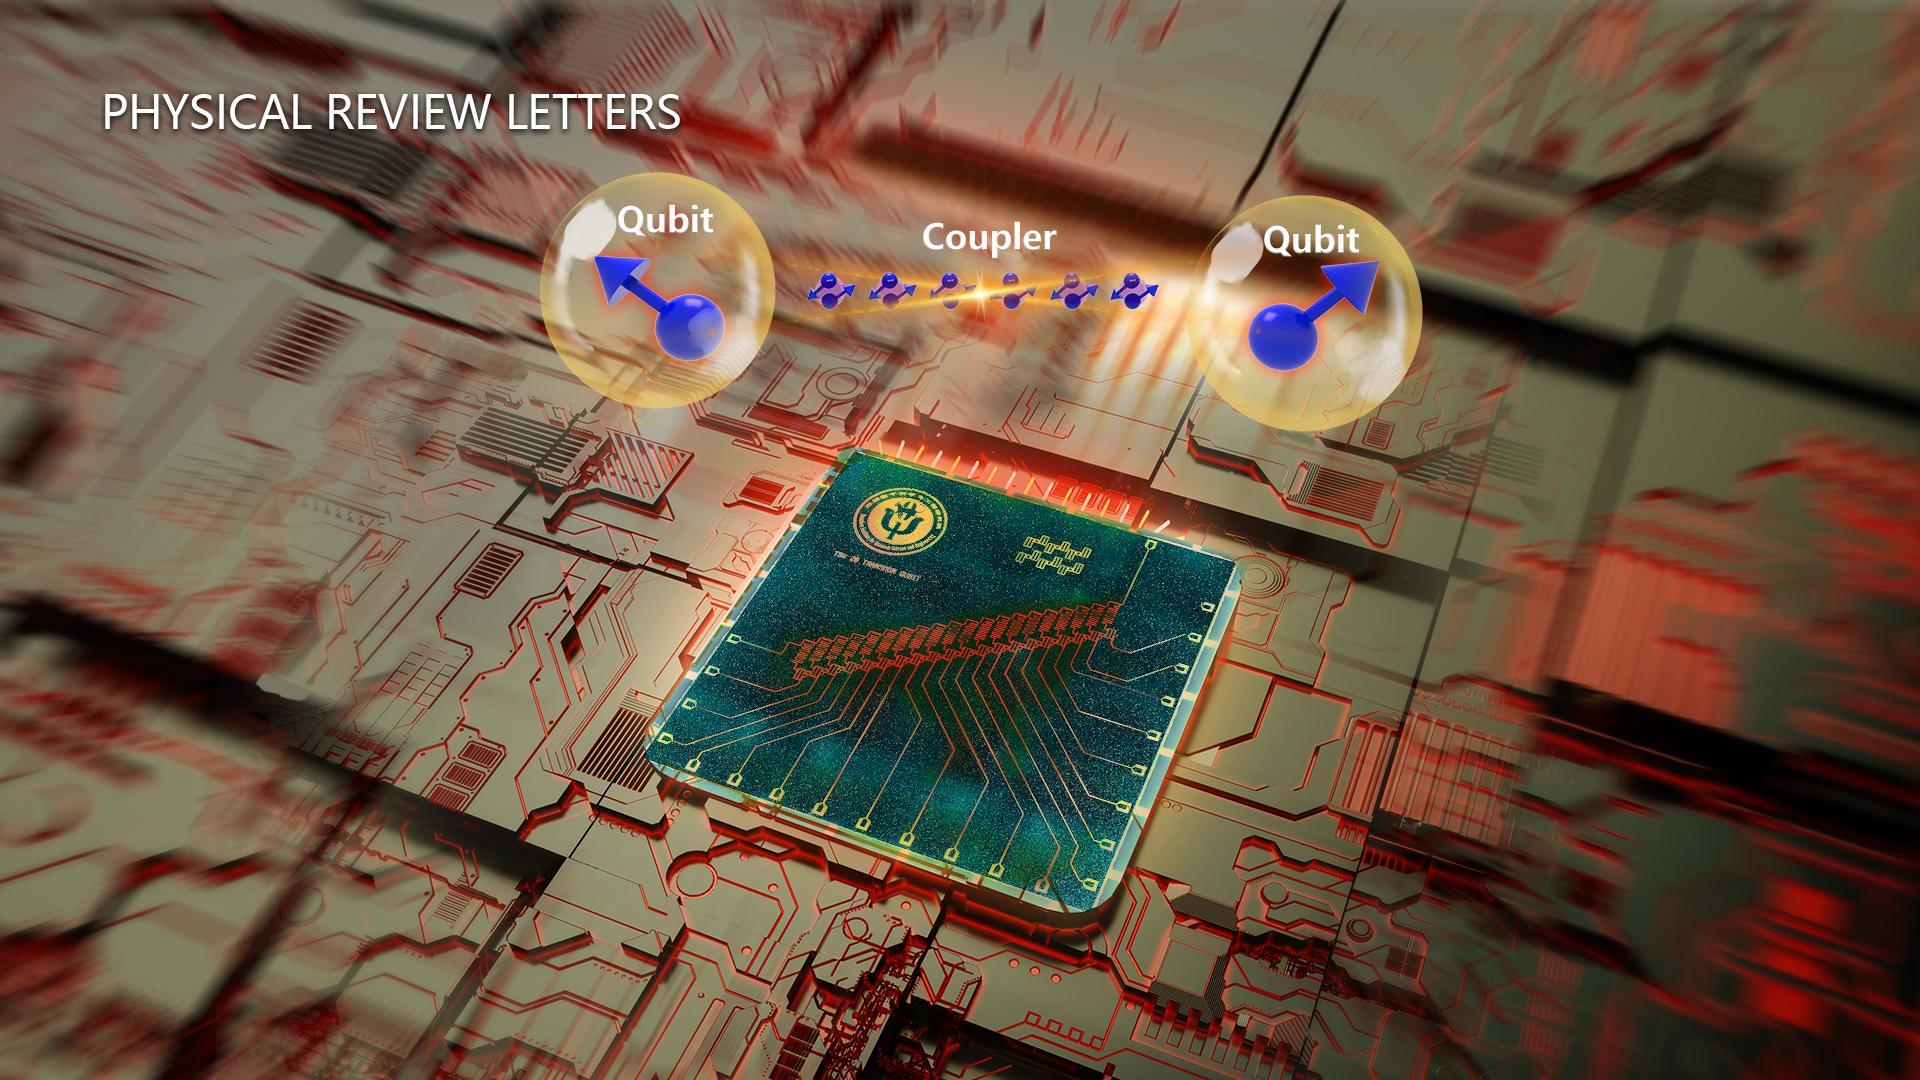 SUSTech researchers make advances in two-qubit quantum gates with superconducting quantum circuit